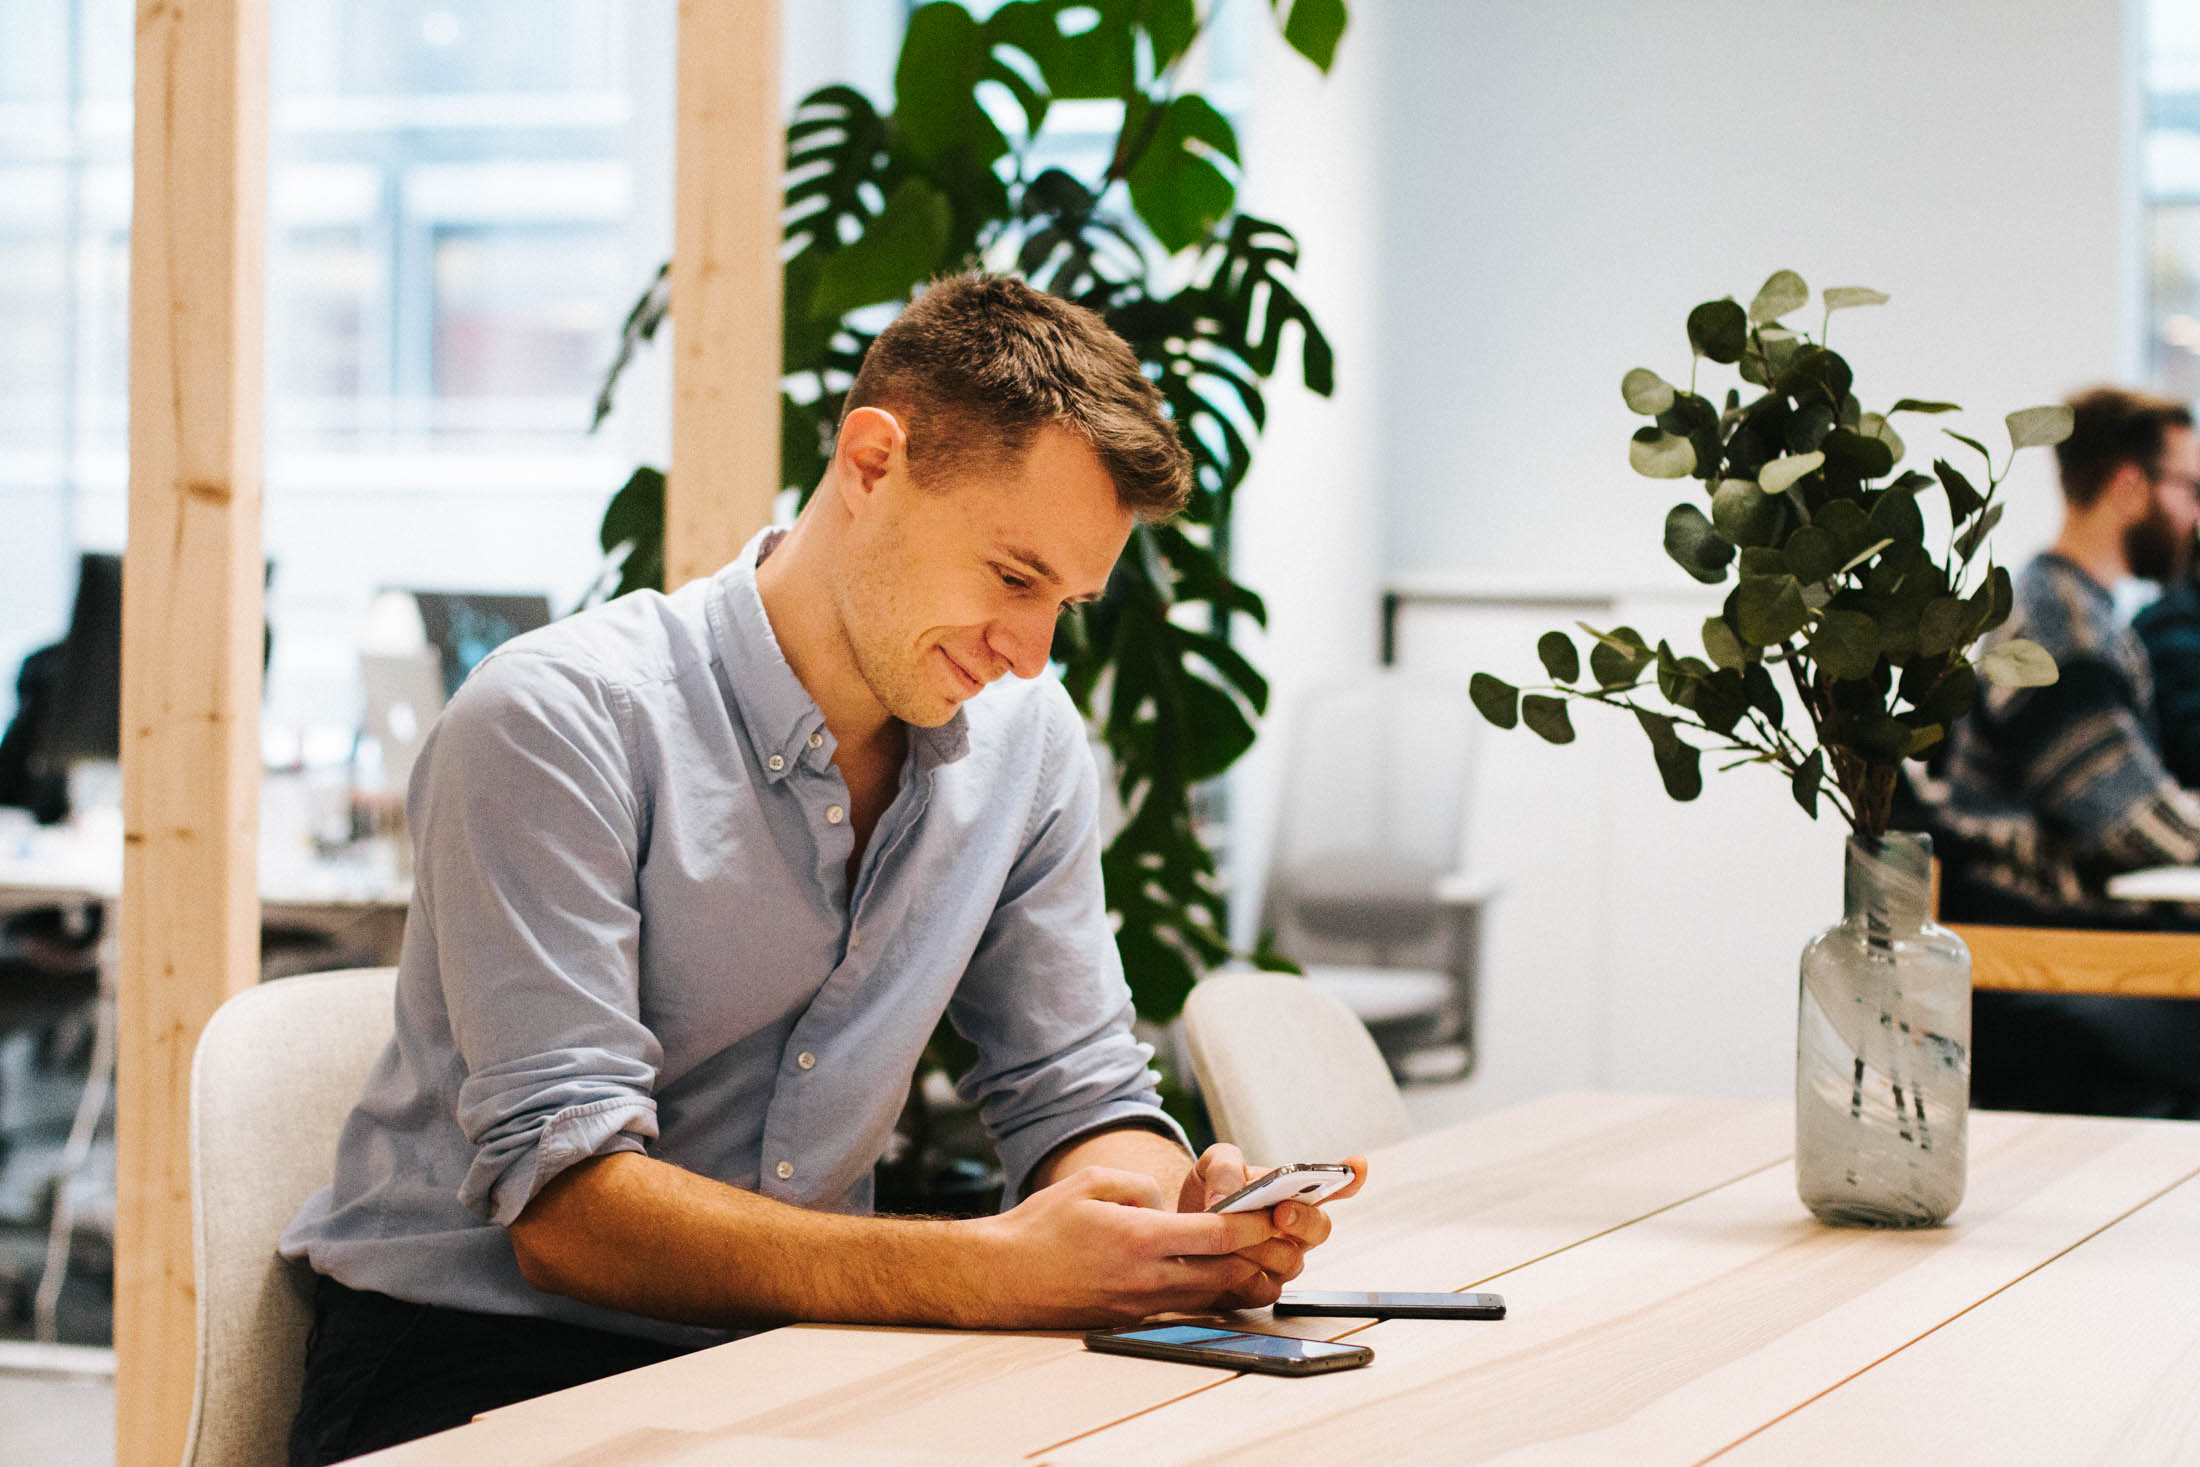 Kristoffer tester en app på en Android-telefon